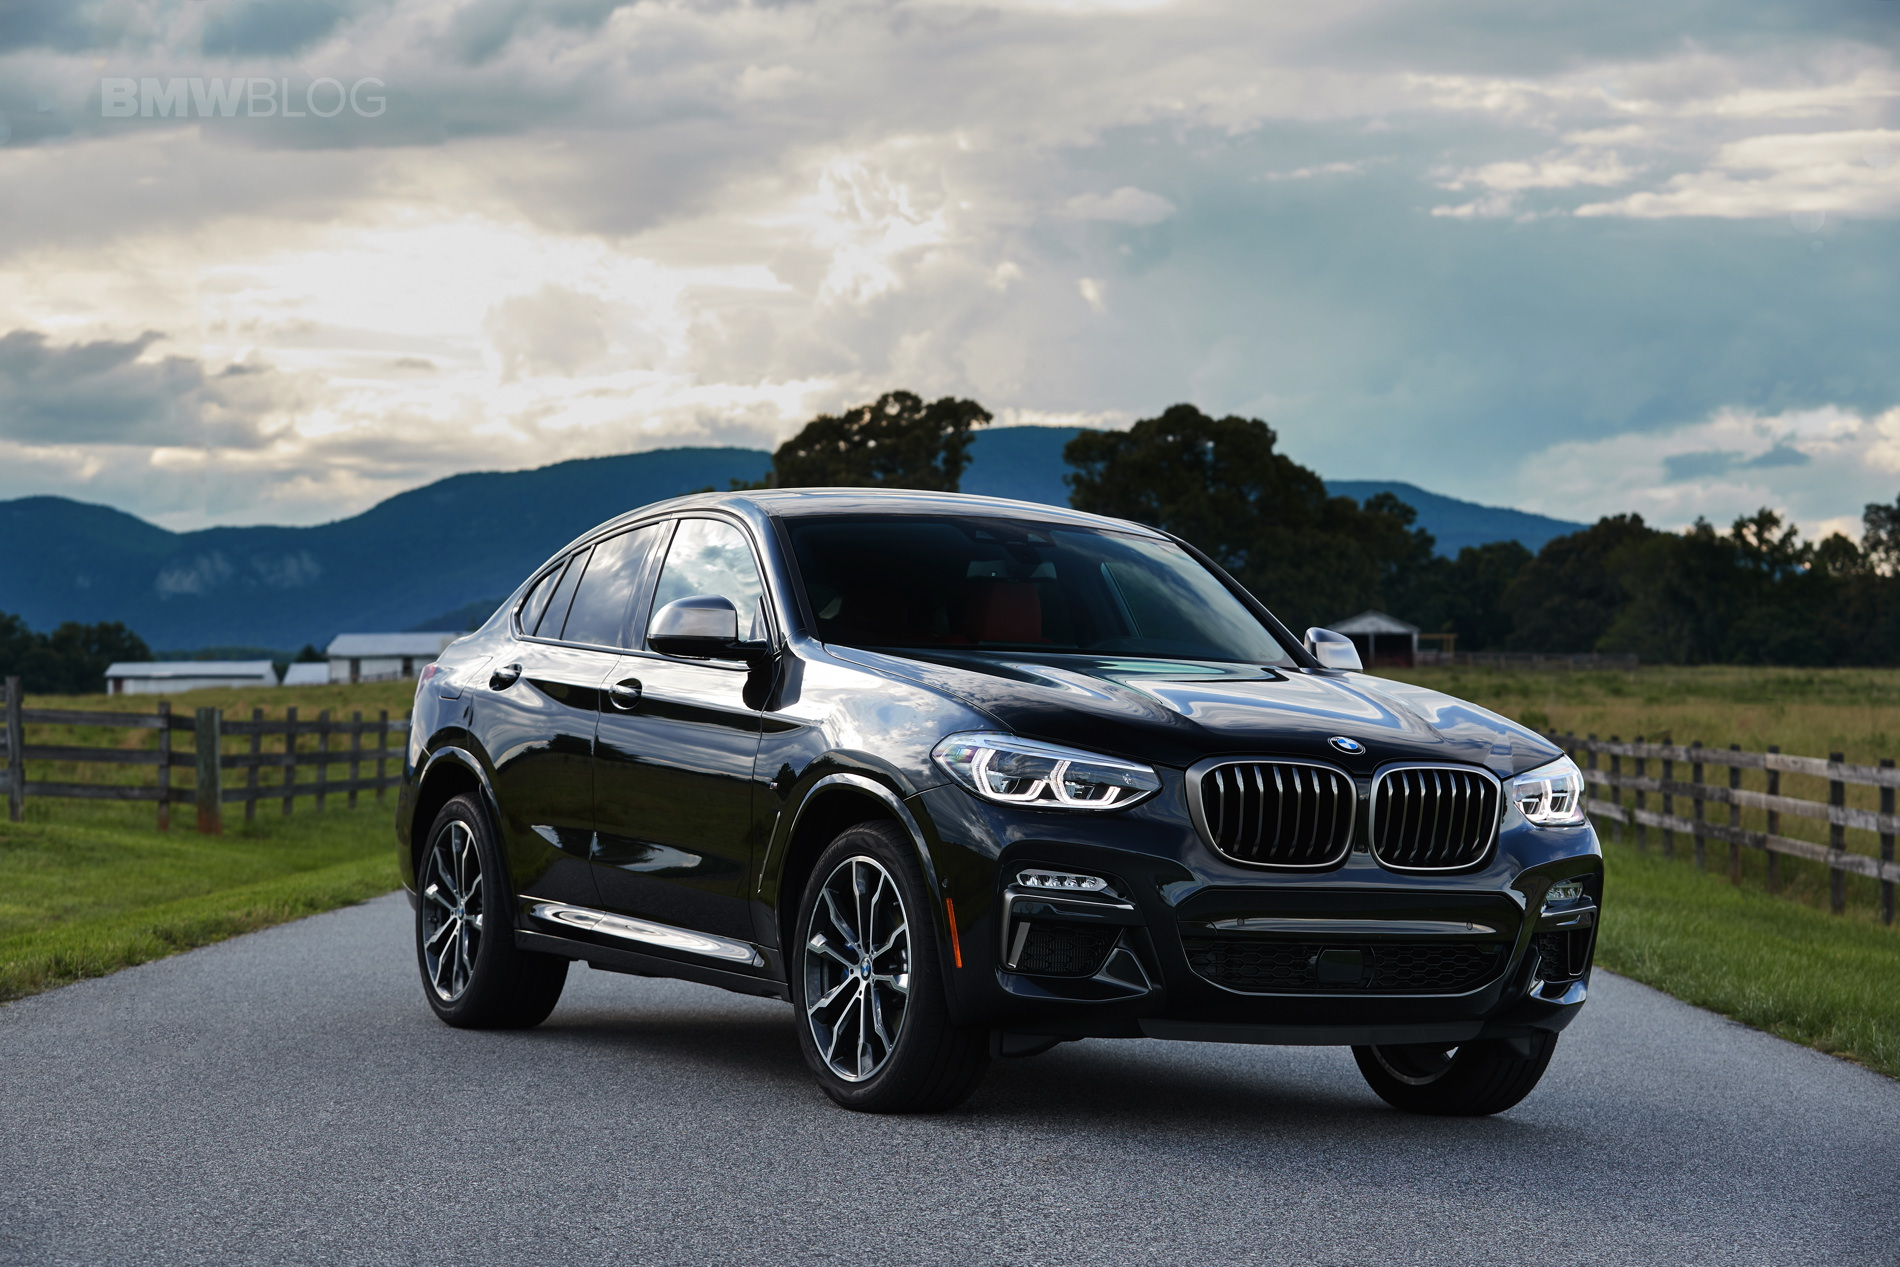 2019 G02 BMW X4 M40i test drive 46